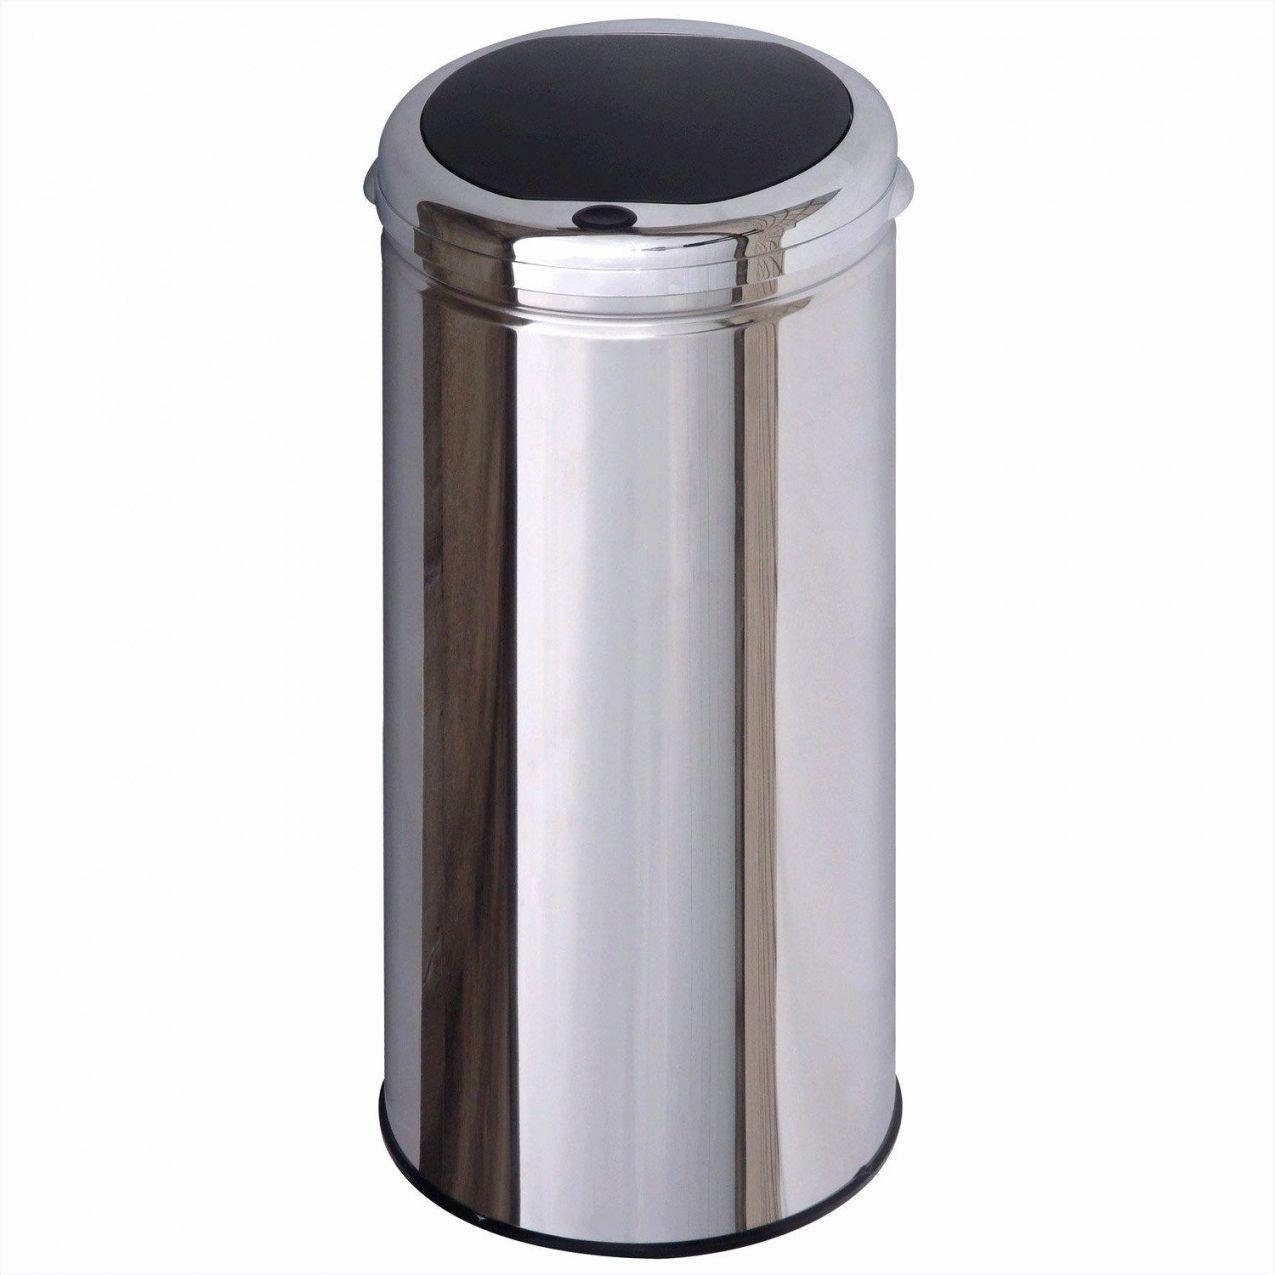 99 Drap De Bain Ikea 2020 Check More At Https Www Unionjacktrooper Com 77 Drap De Bain Ikea 2017 Trash Can Tall Trash Can Kitchen Design